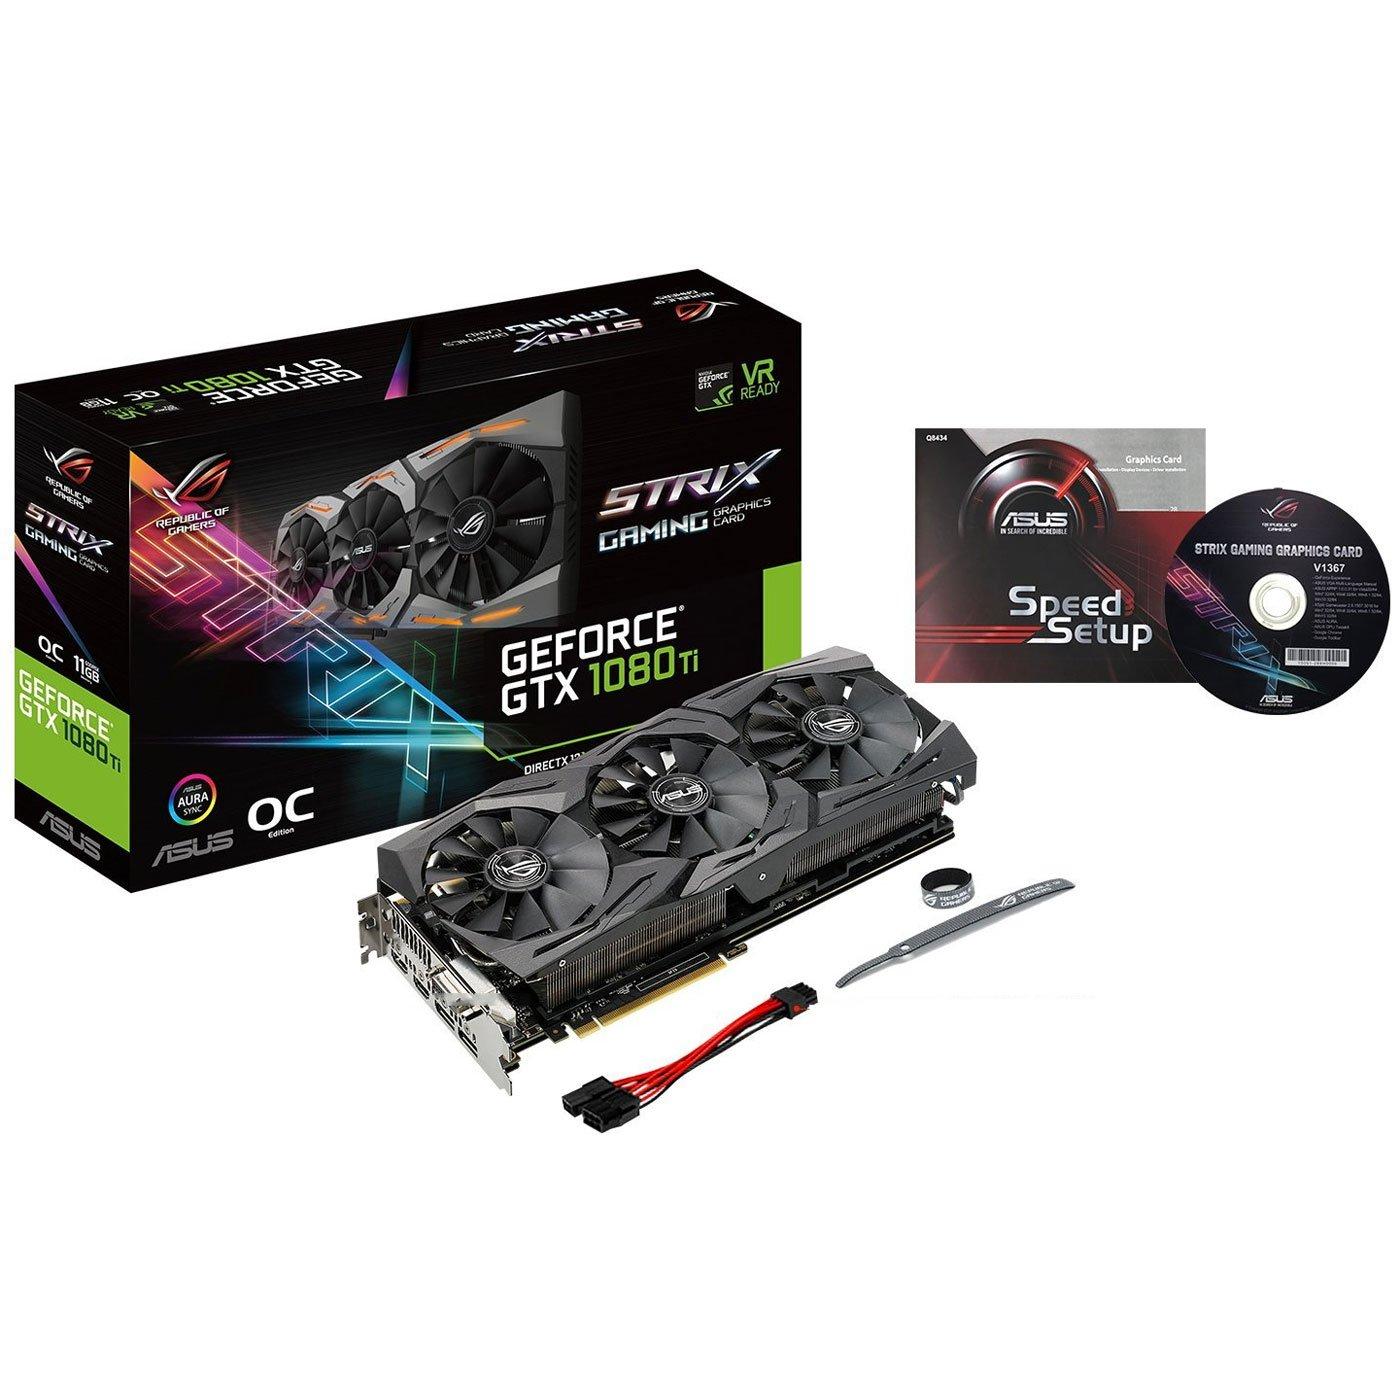 ASUS ROG-STRIX-GTX1080TI-O11G-GAMING GeForce 11GB OC Edition VR Ready 5K HD Gaming HDMI DisplayPort DVI Overclocked PC GDDR5X Graphics Card by Asus (Image #5)